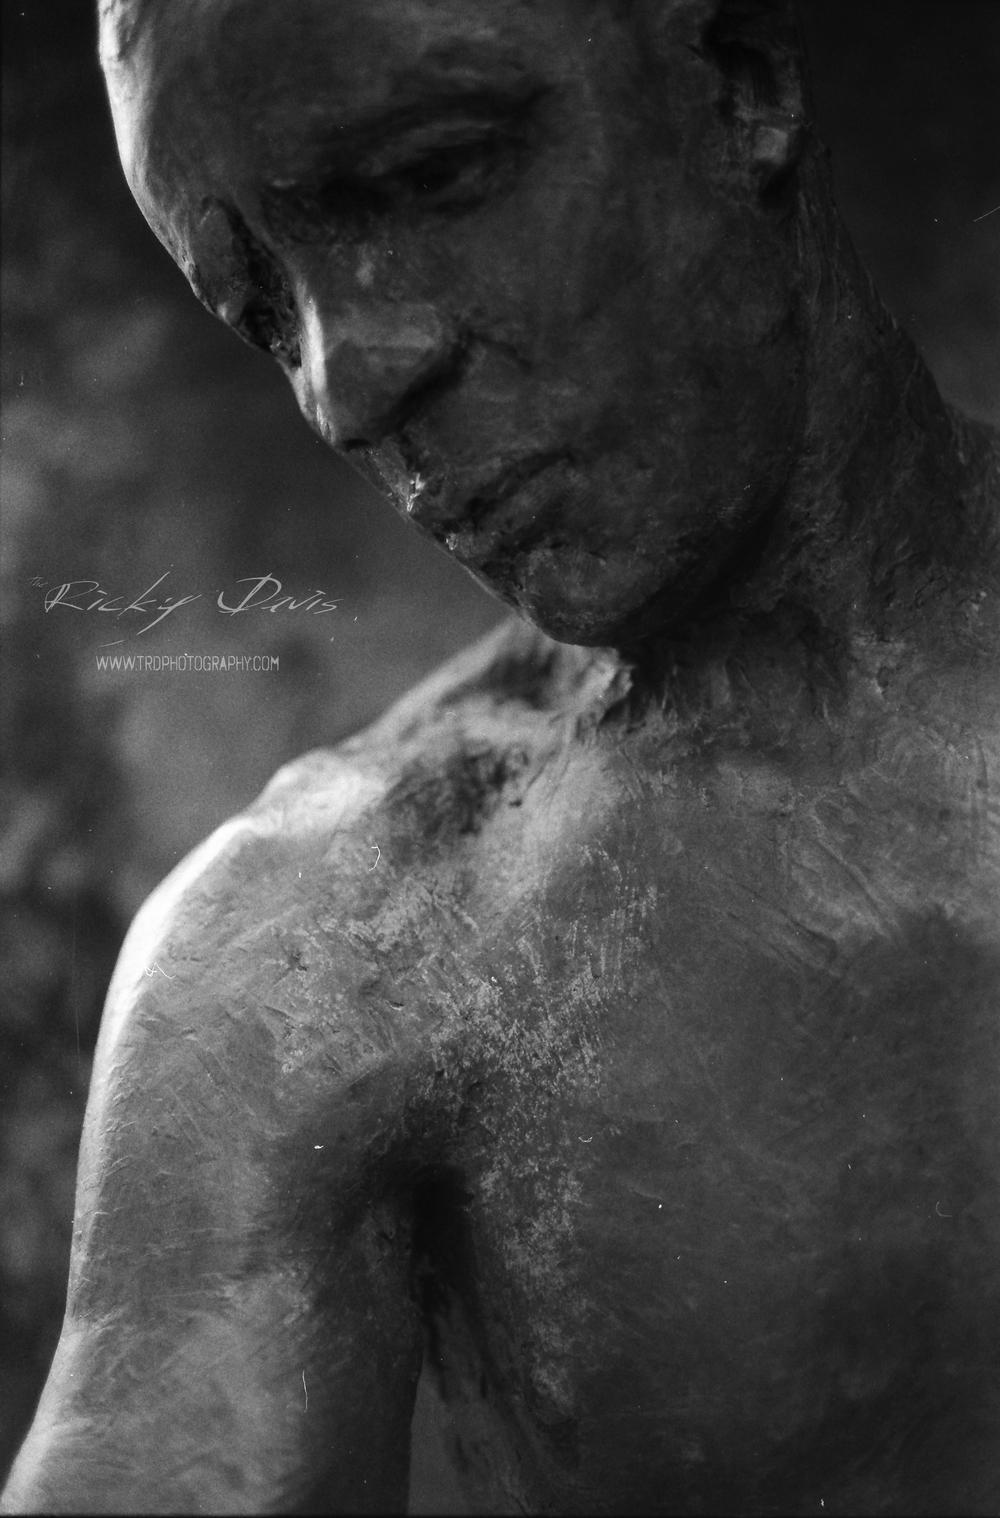 Street Sculpture in Chattanooga, TN - Film - Expired Neopan SS - Camera - Minolta XG 1 - Photographer Ricky Davis